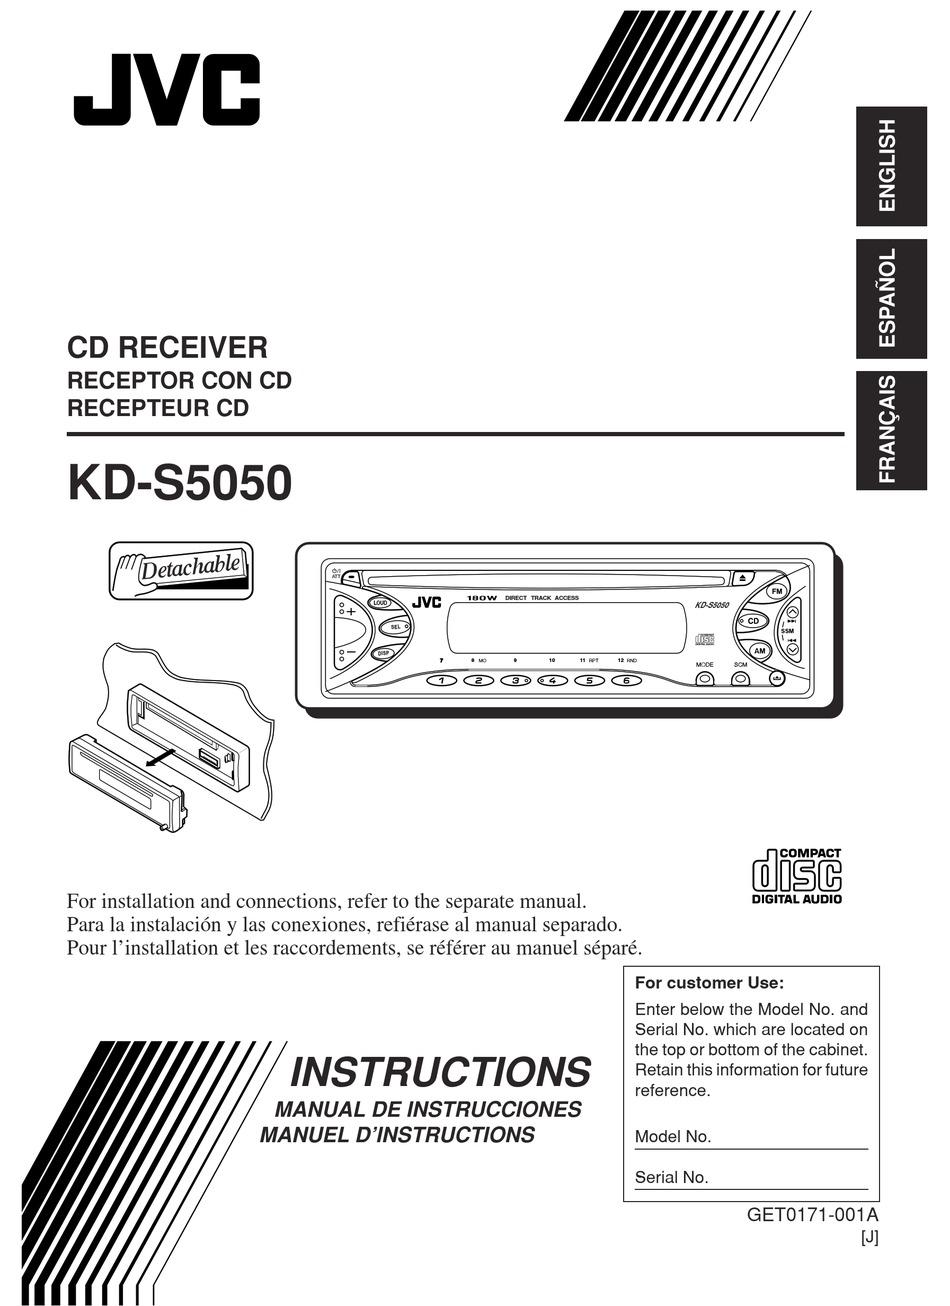 Jvc Kd S5050 Instructions Manual Pdf